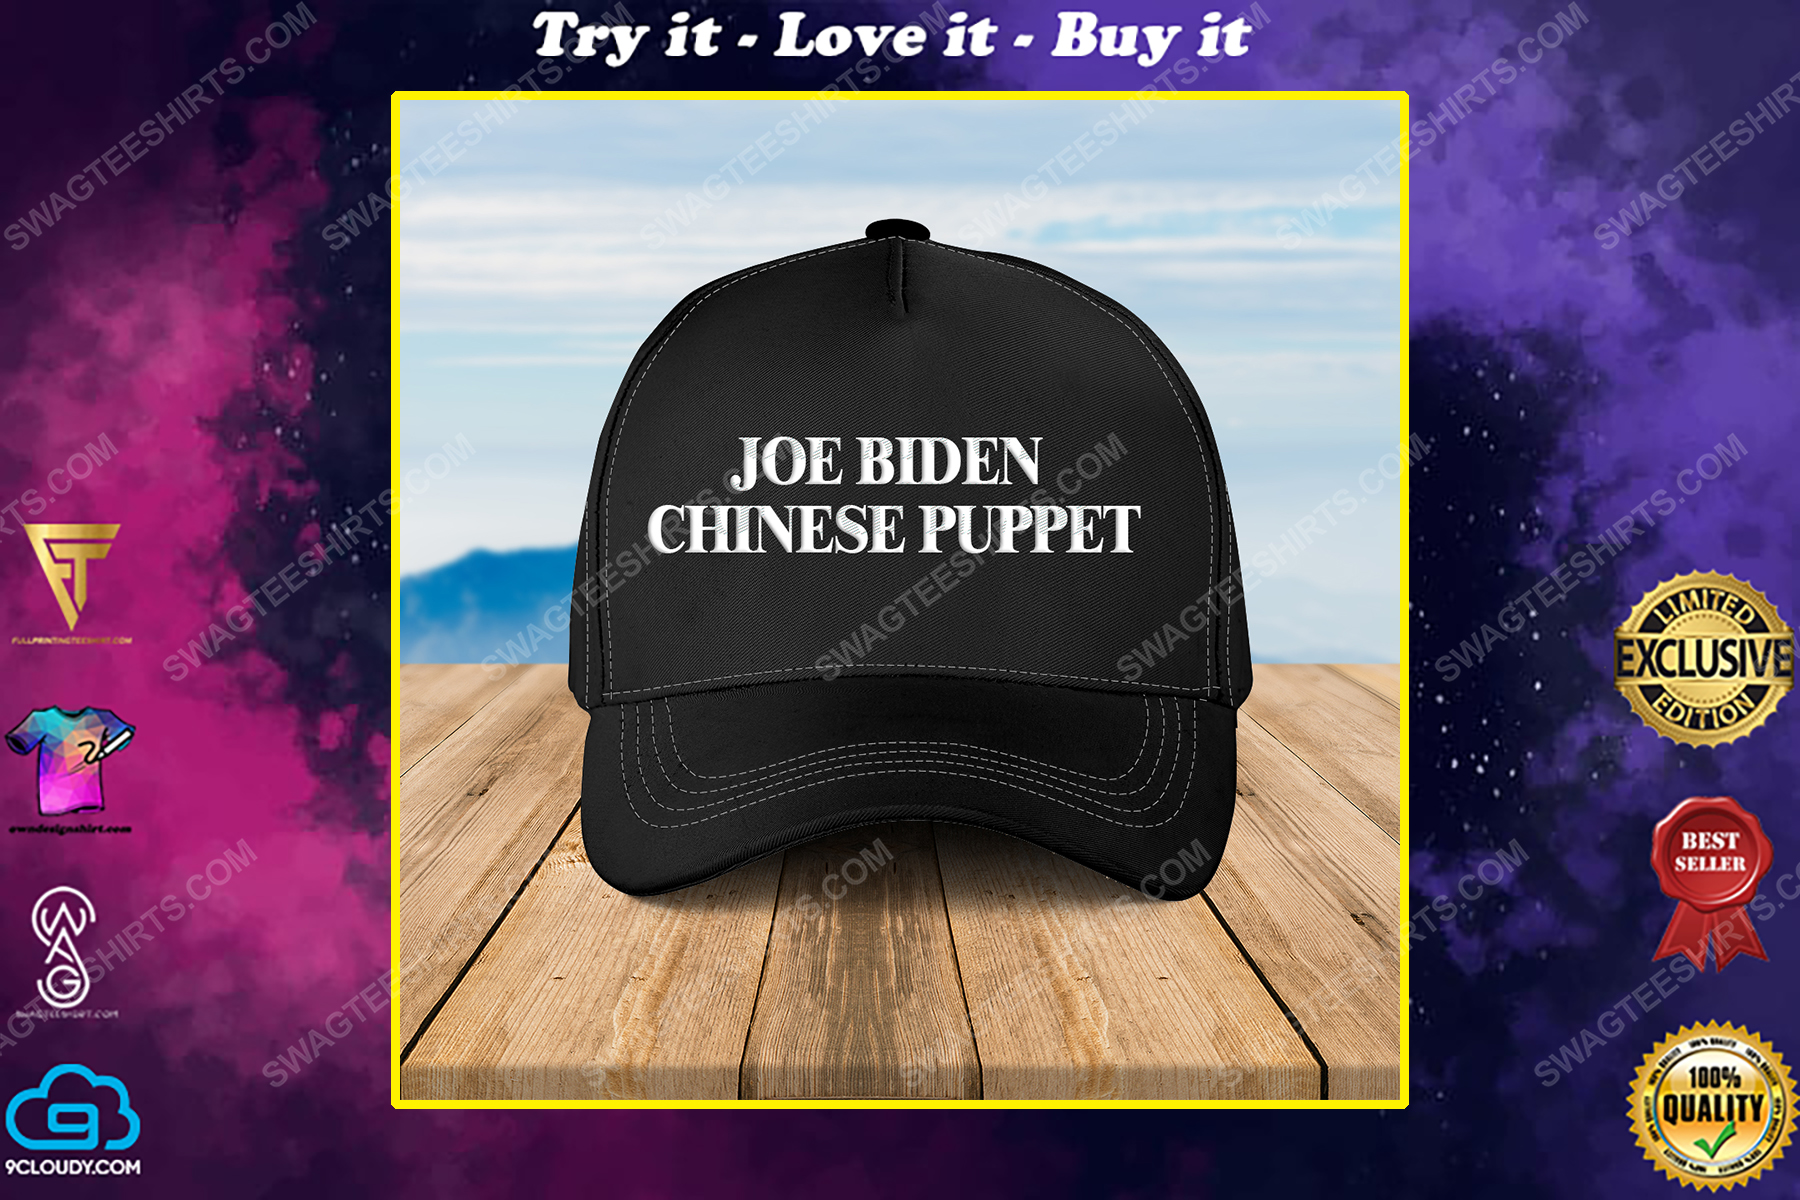 Joe biden chinese puppet full print classic hat